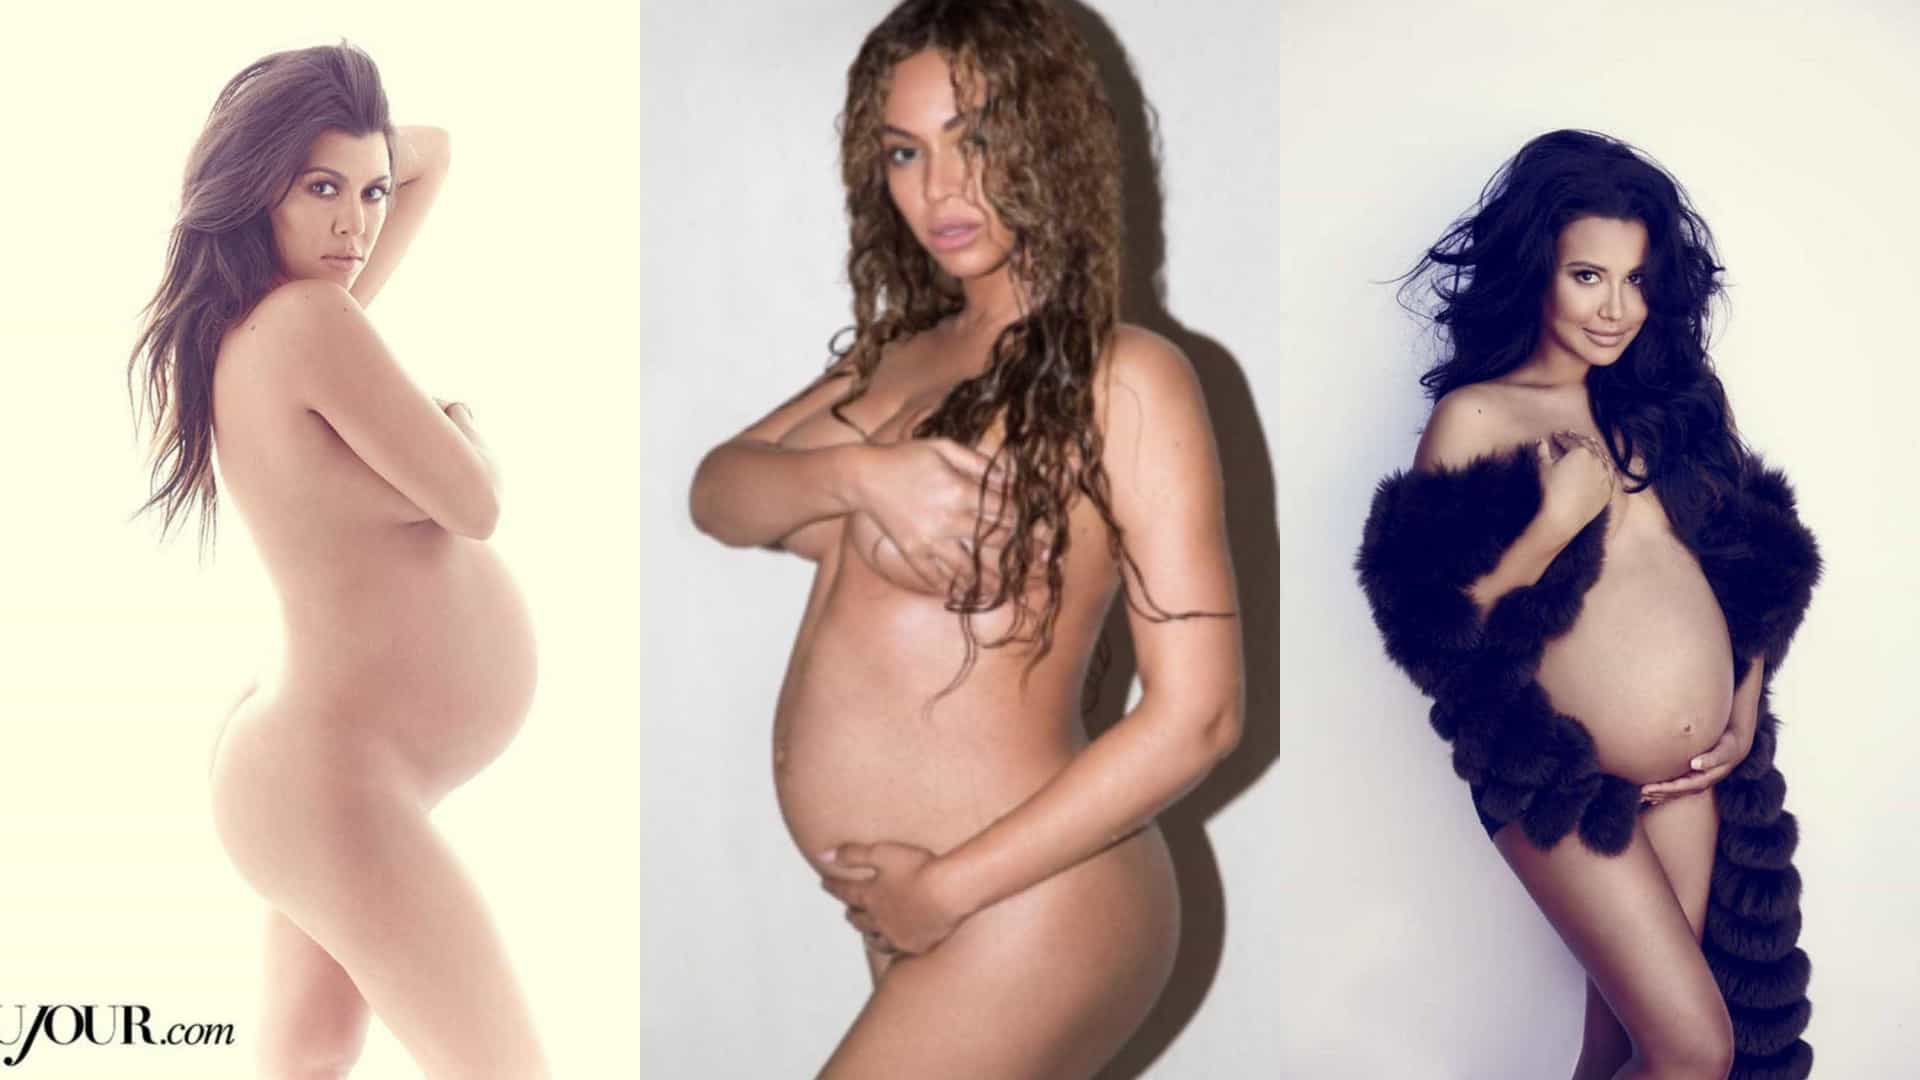 Fotos Mulheres Famosas Nuas famosas que posaram nuas durante a gravidez